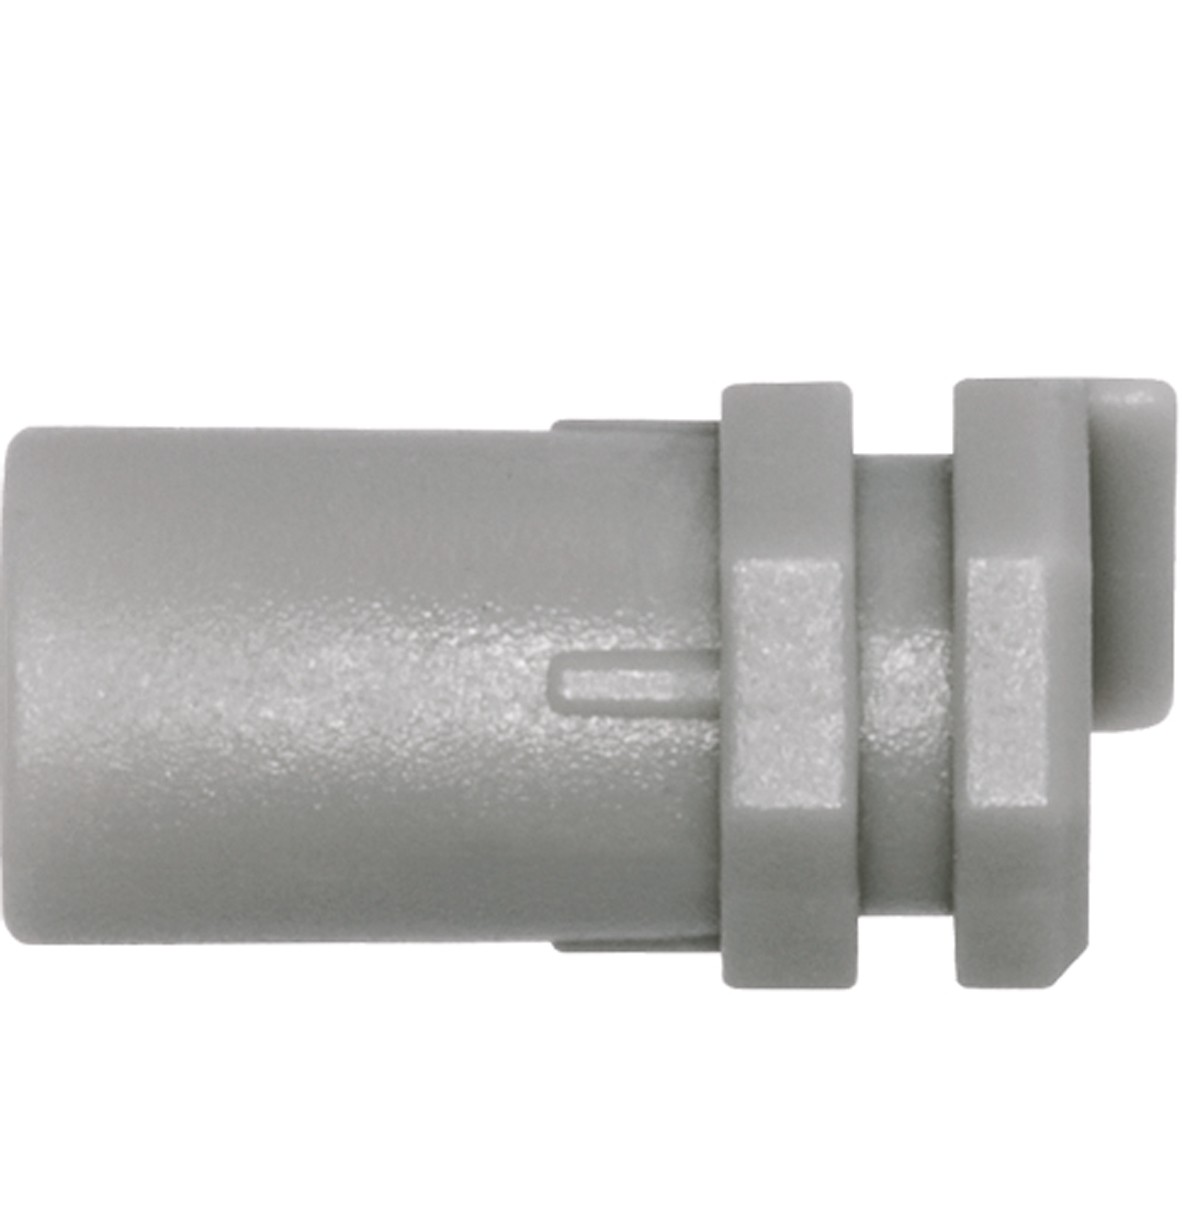 TL RP Positionierzylinder